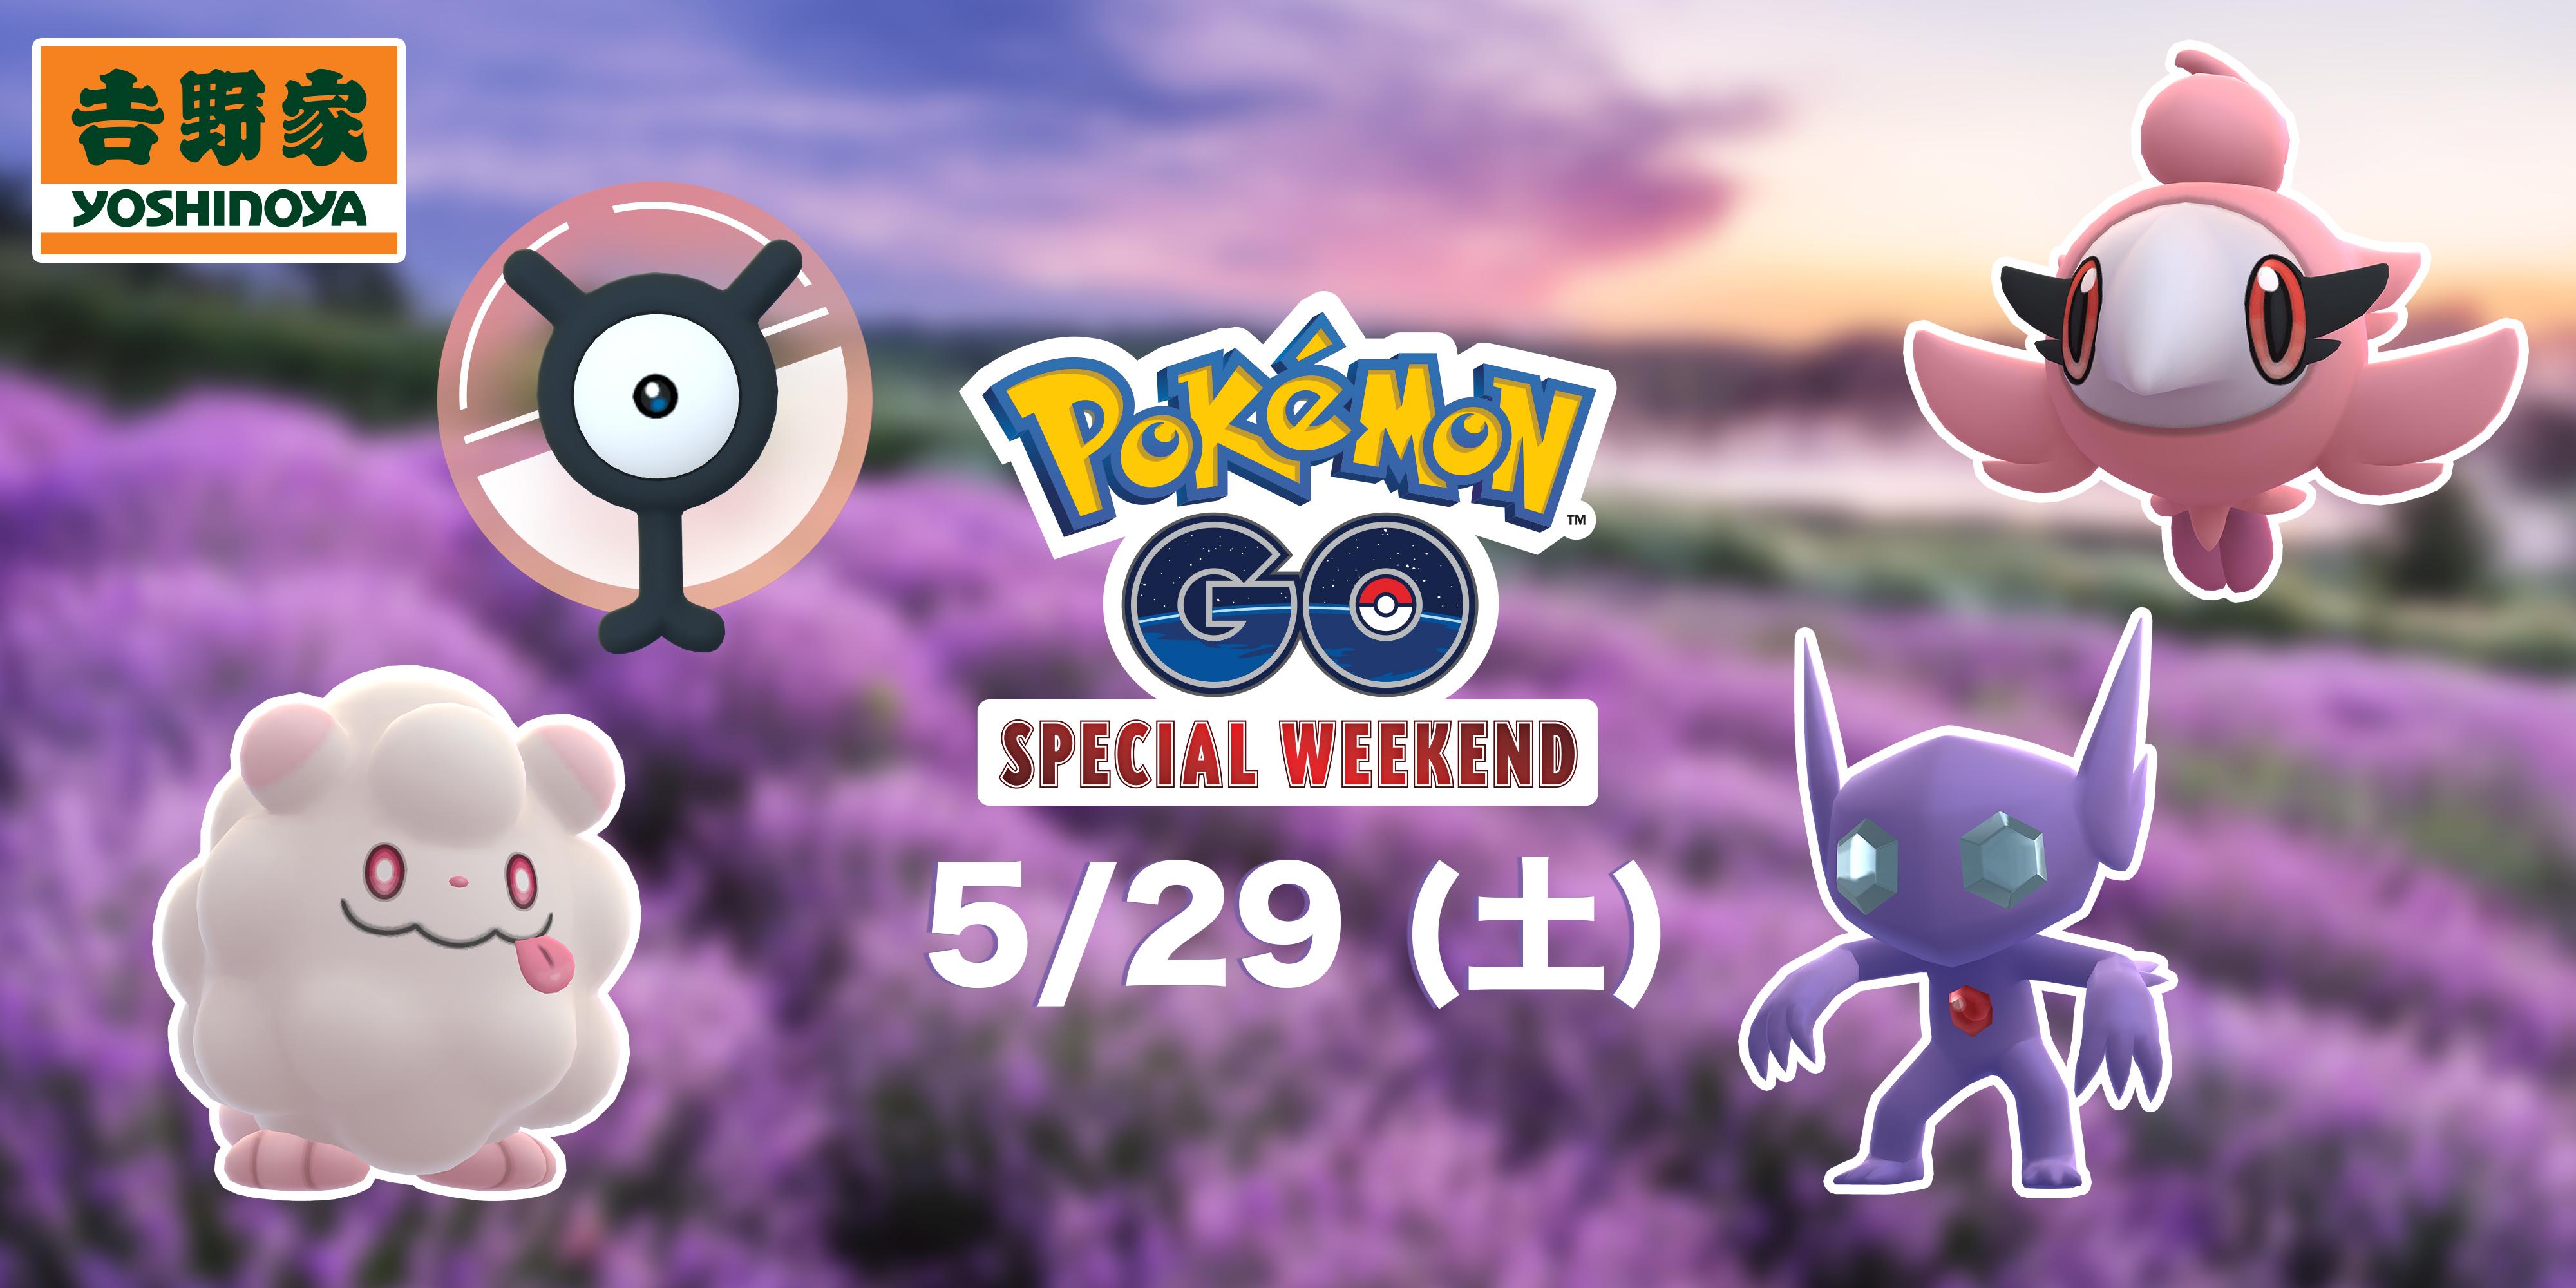 「Pokémon GO Special Weekend」のご案内!